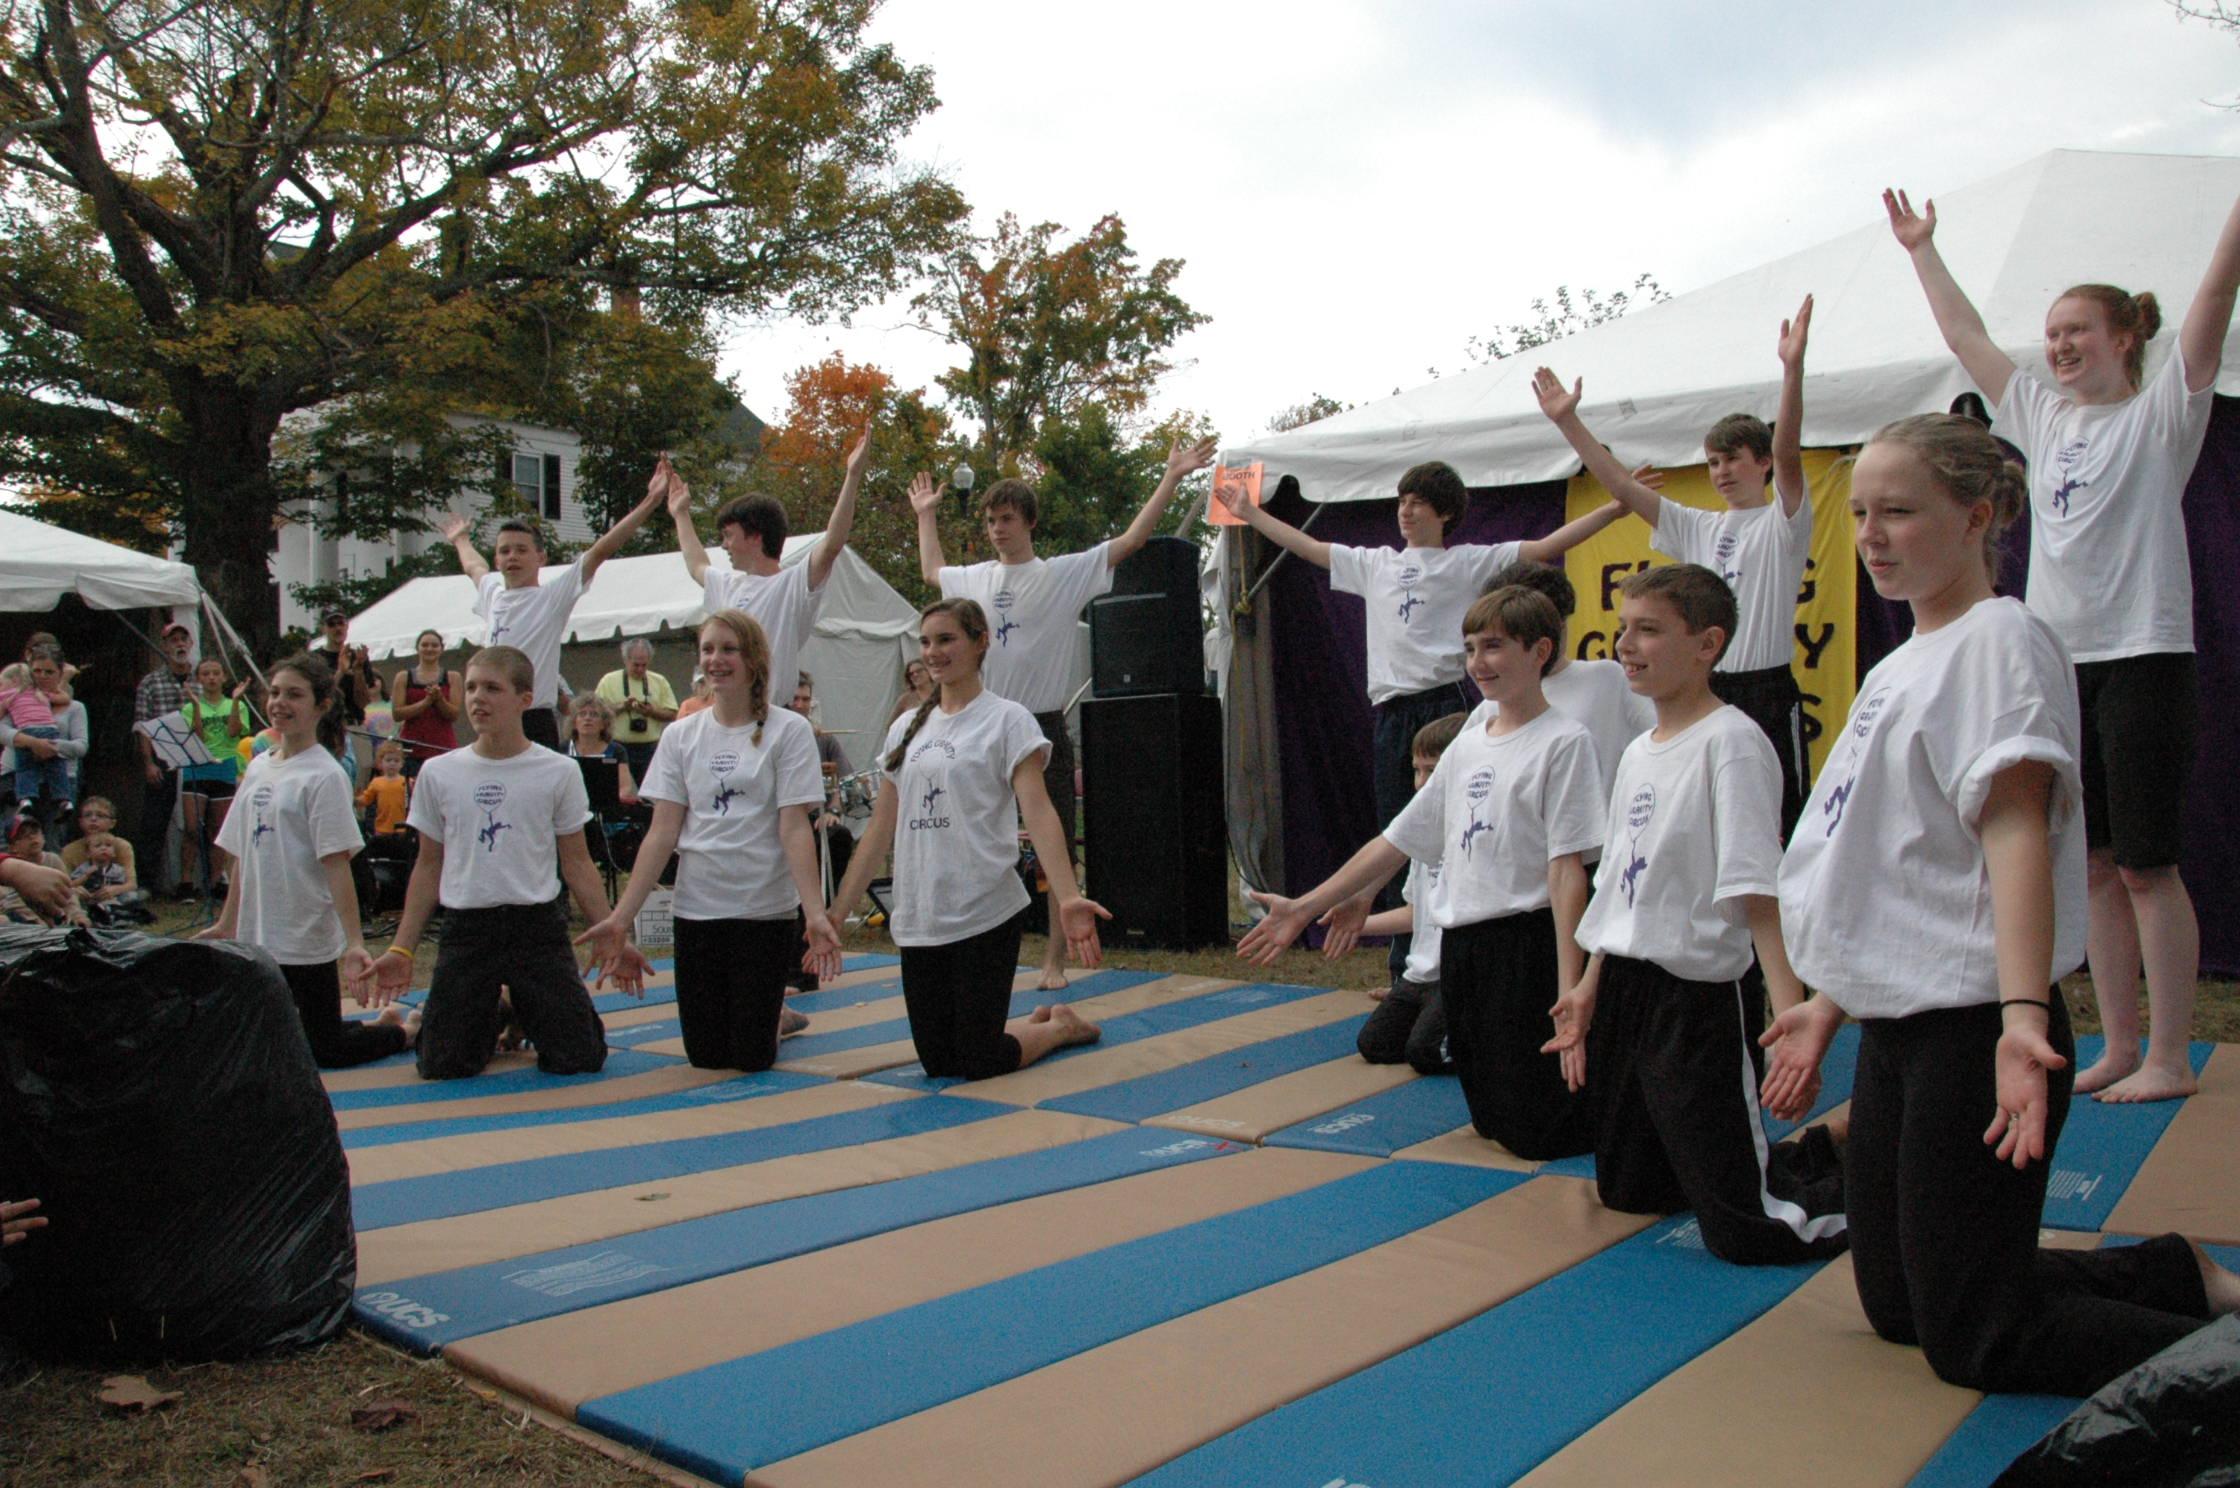 2012-10-06 Flyin Gravity Circus - Pumpkin 145.JPG